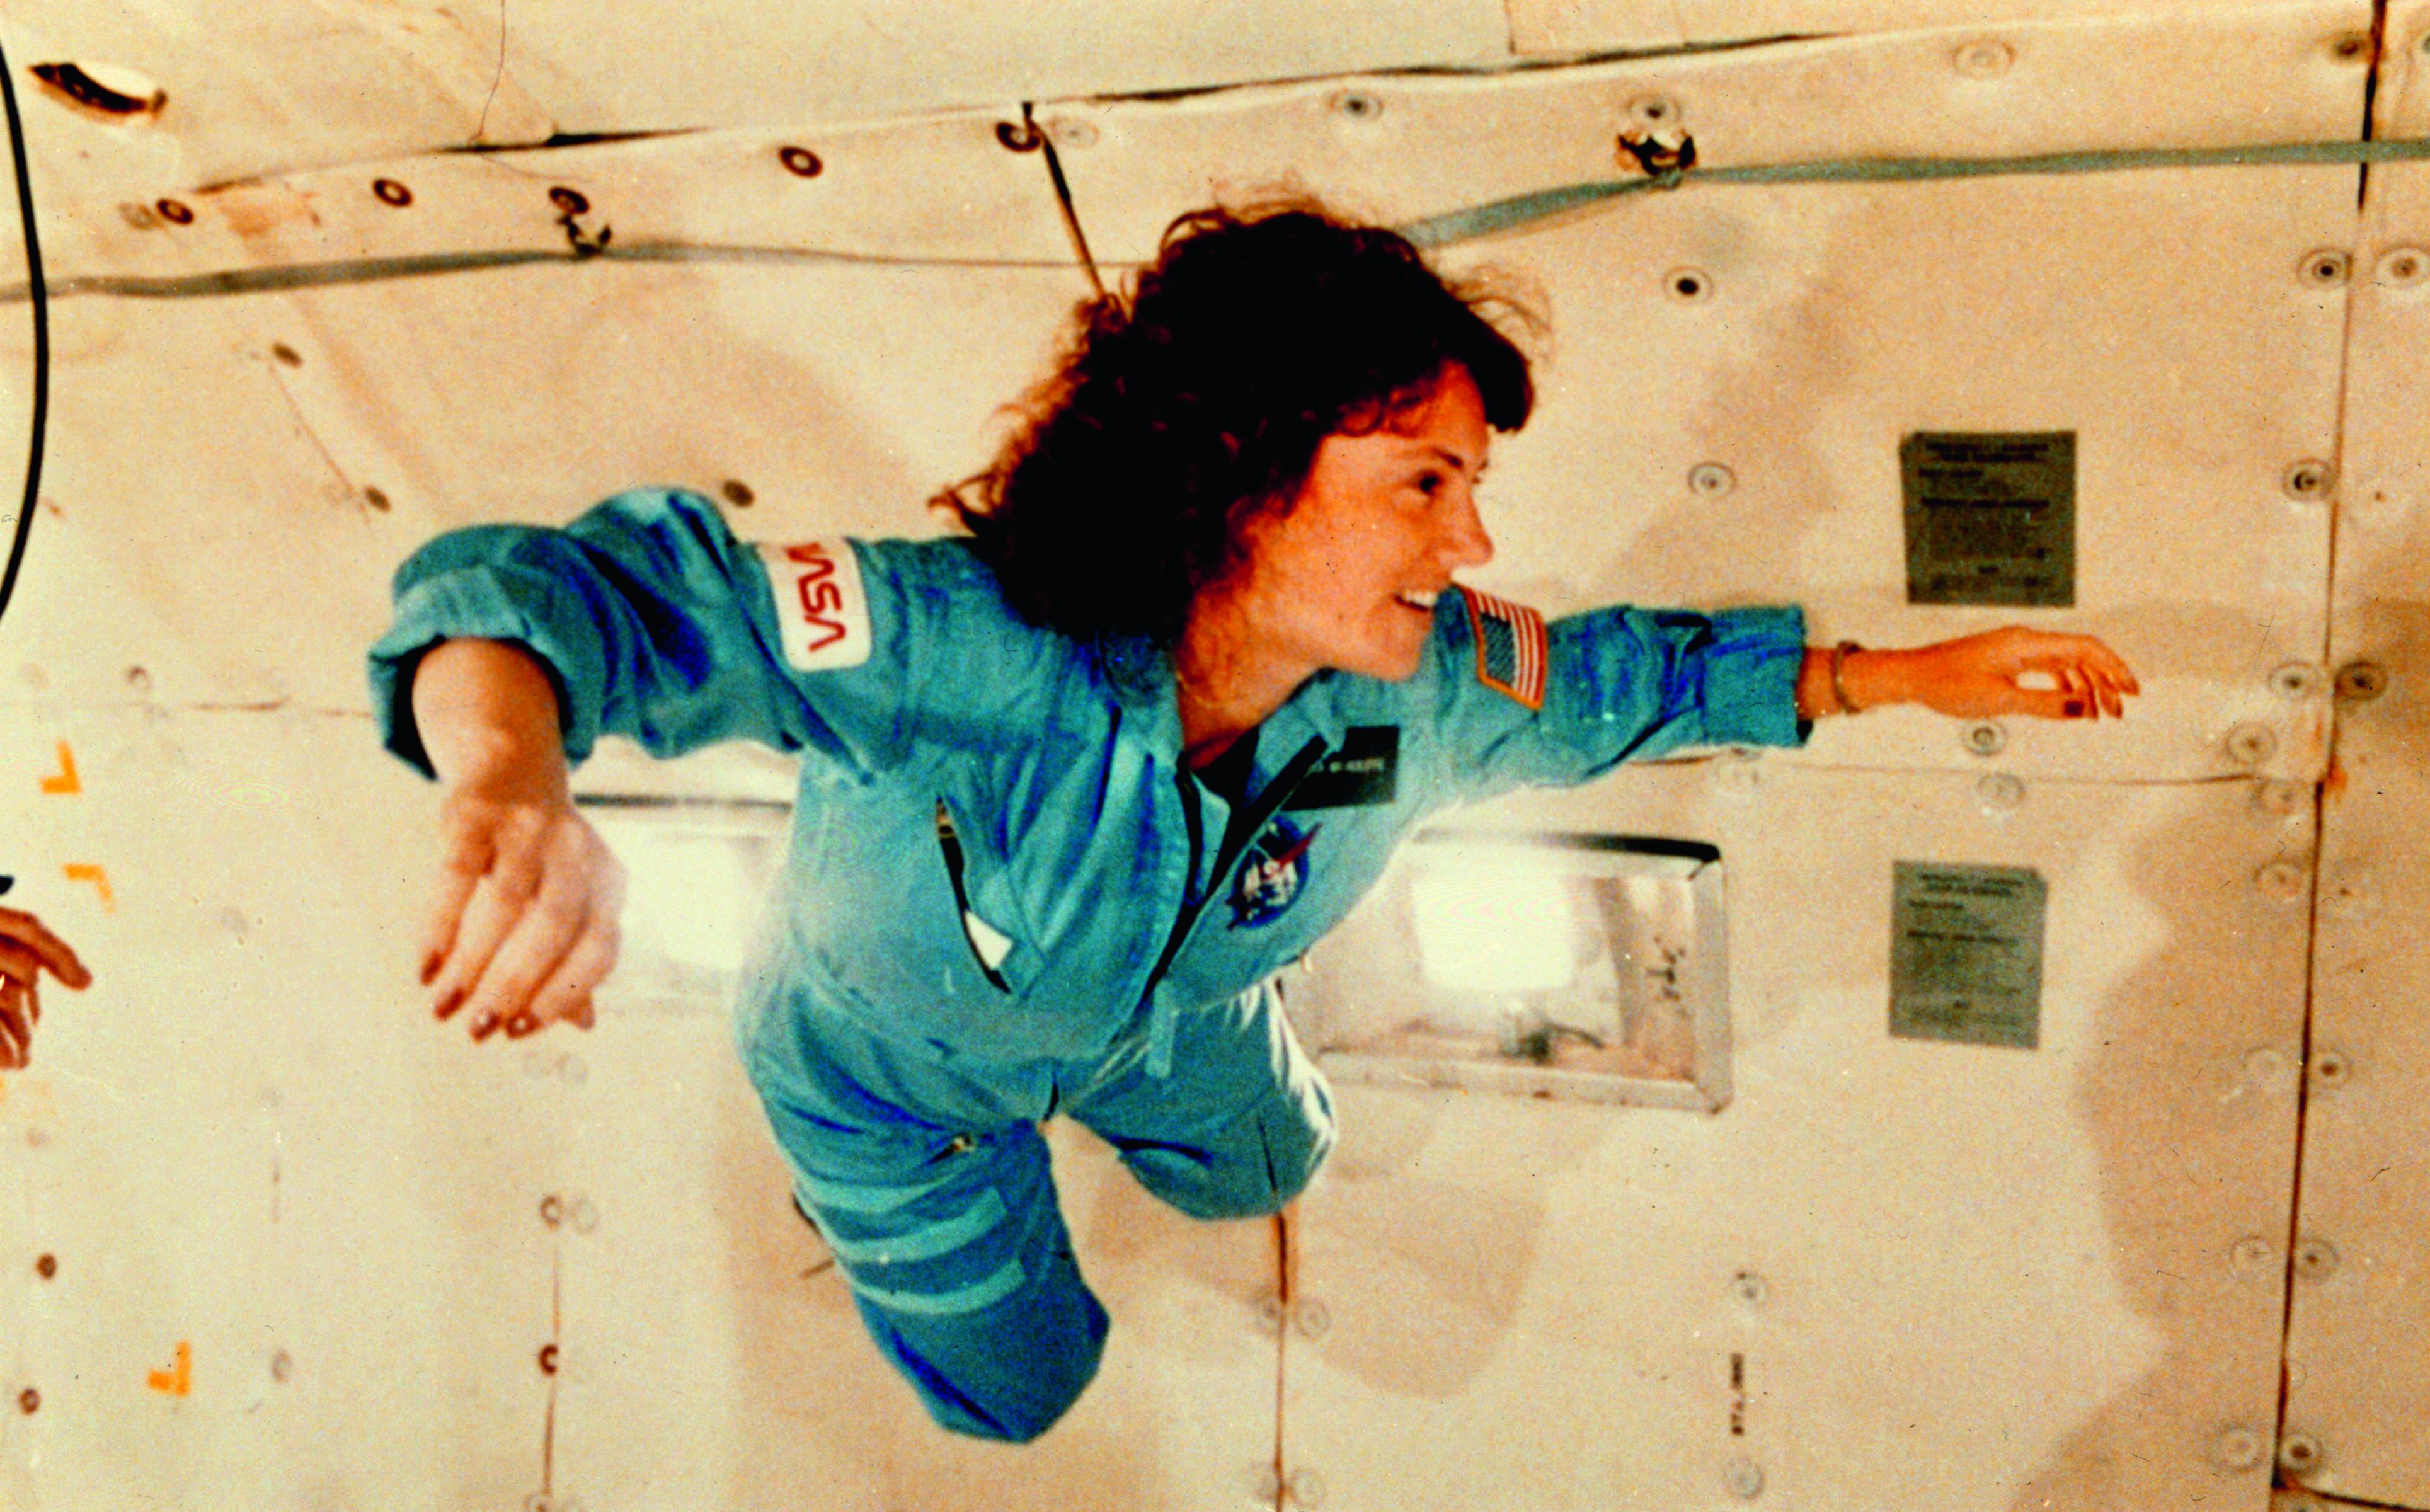 christa_mcauliffe_experiences_weightlessness_during_kc-135_flight_-_gpn-2002-000149